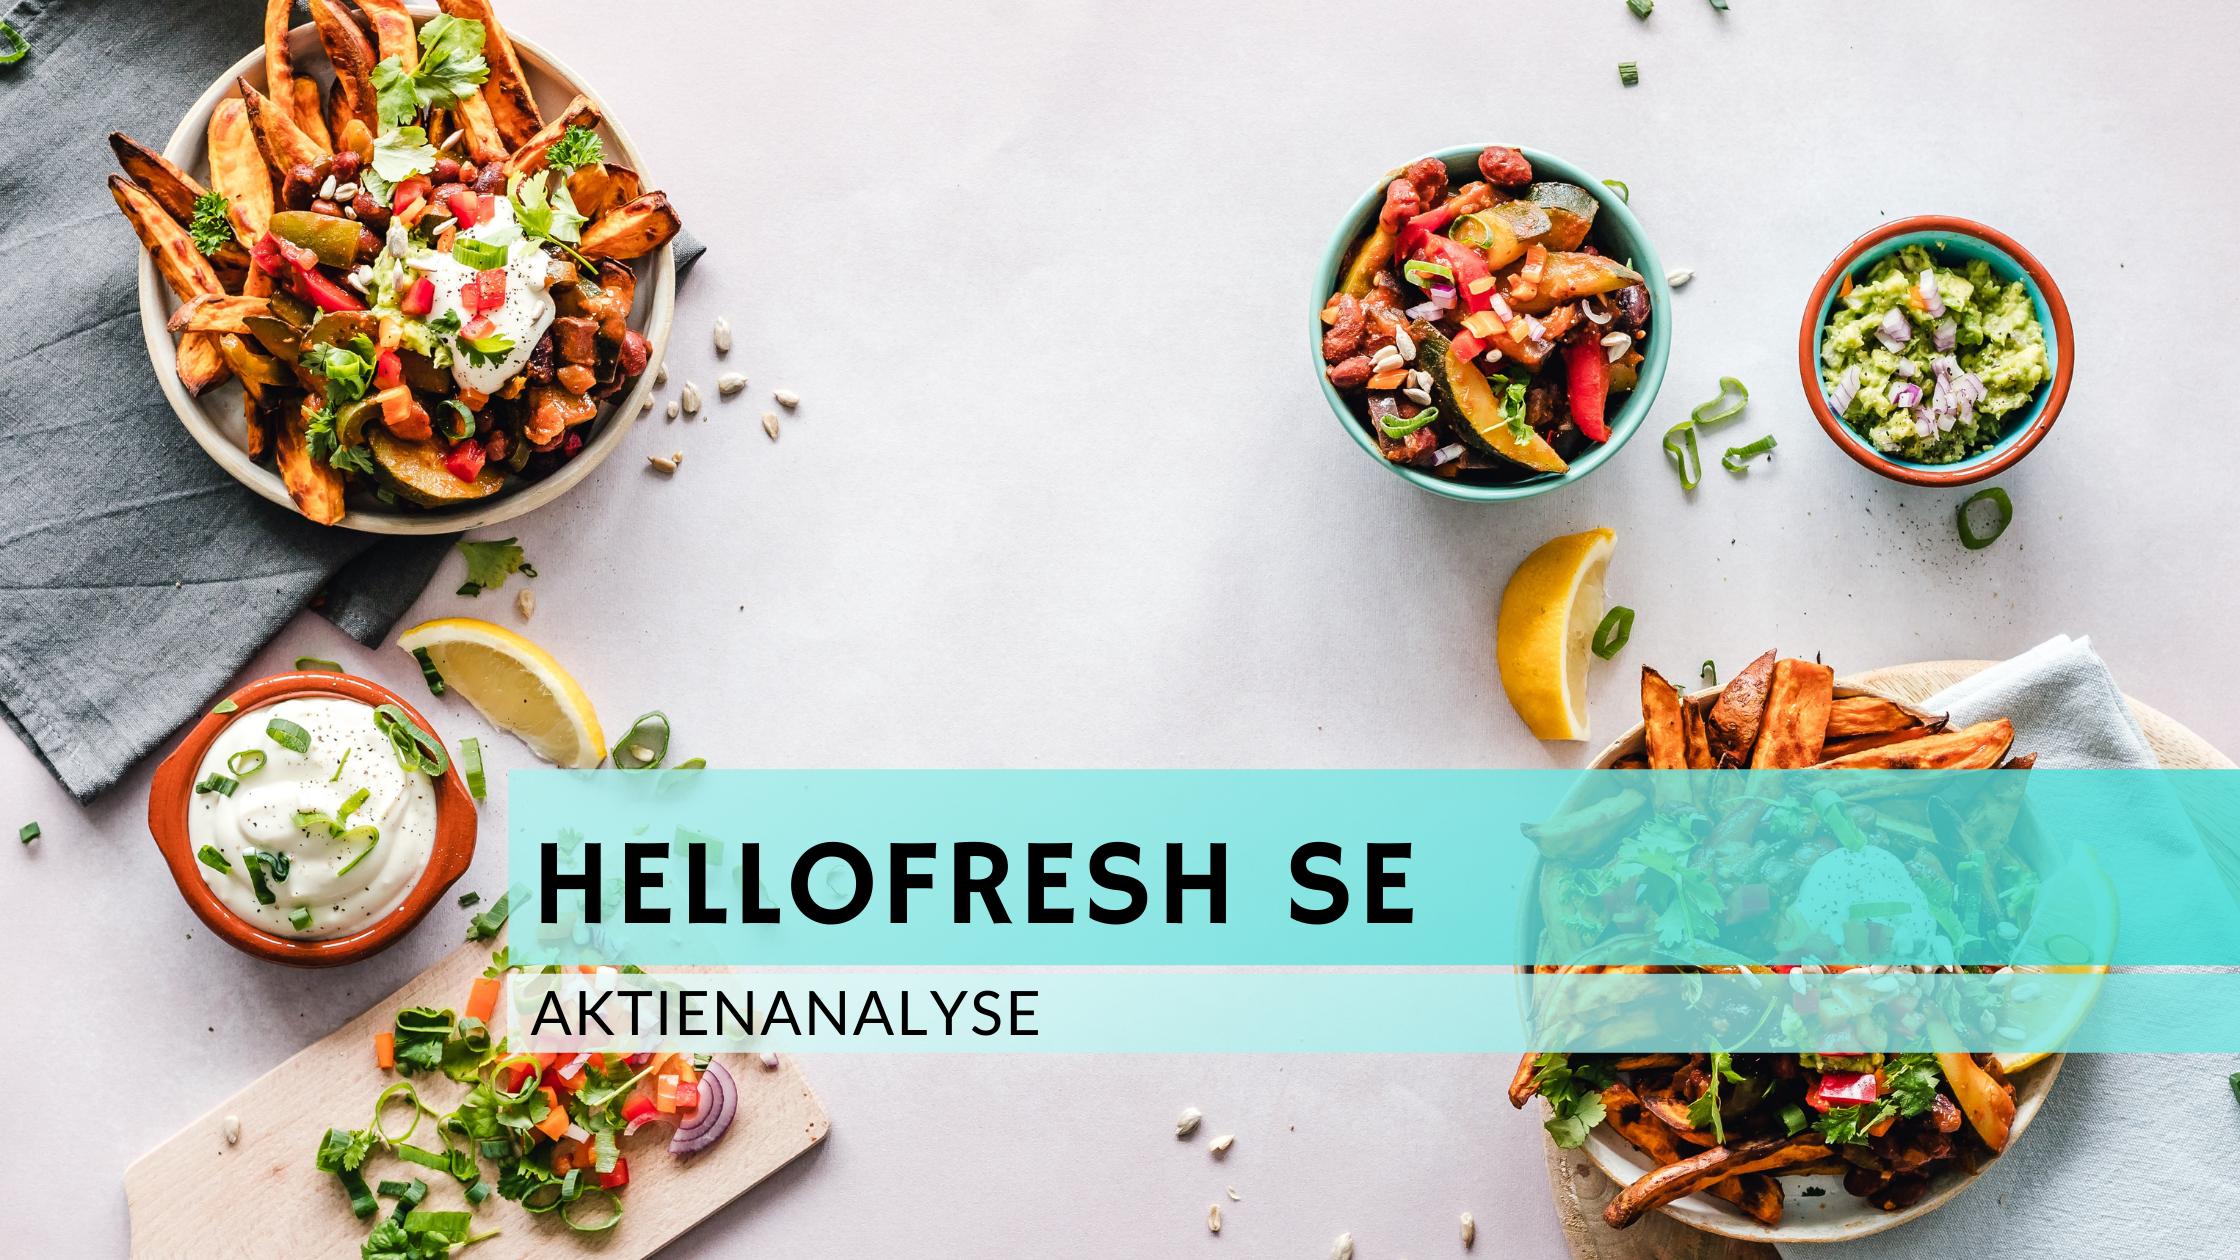 Hellofresh Aktienanalyse